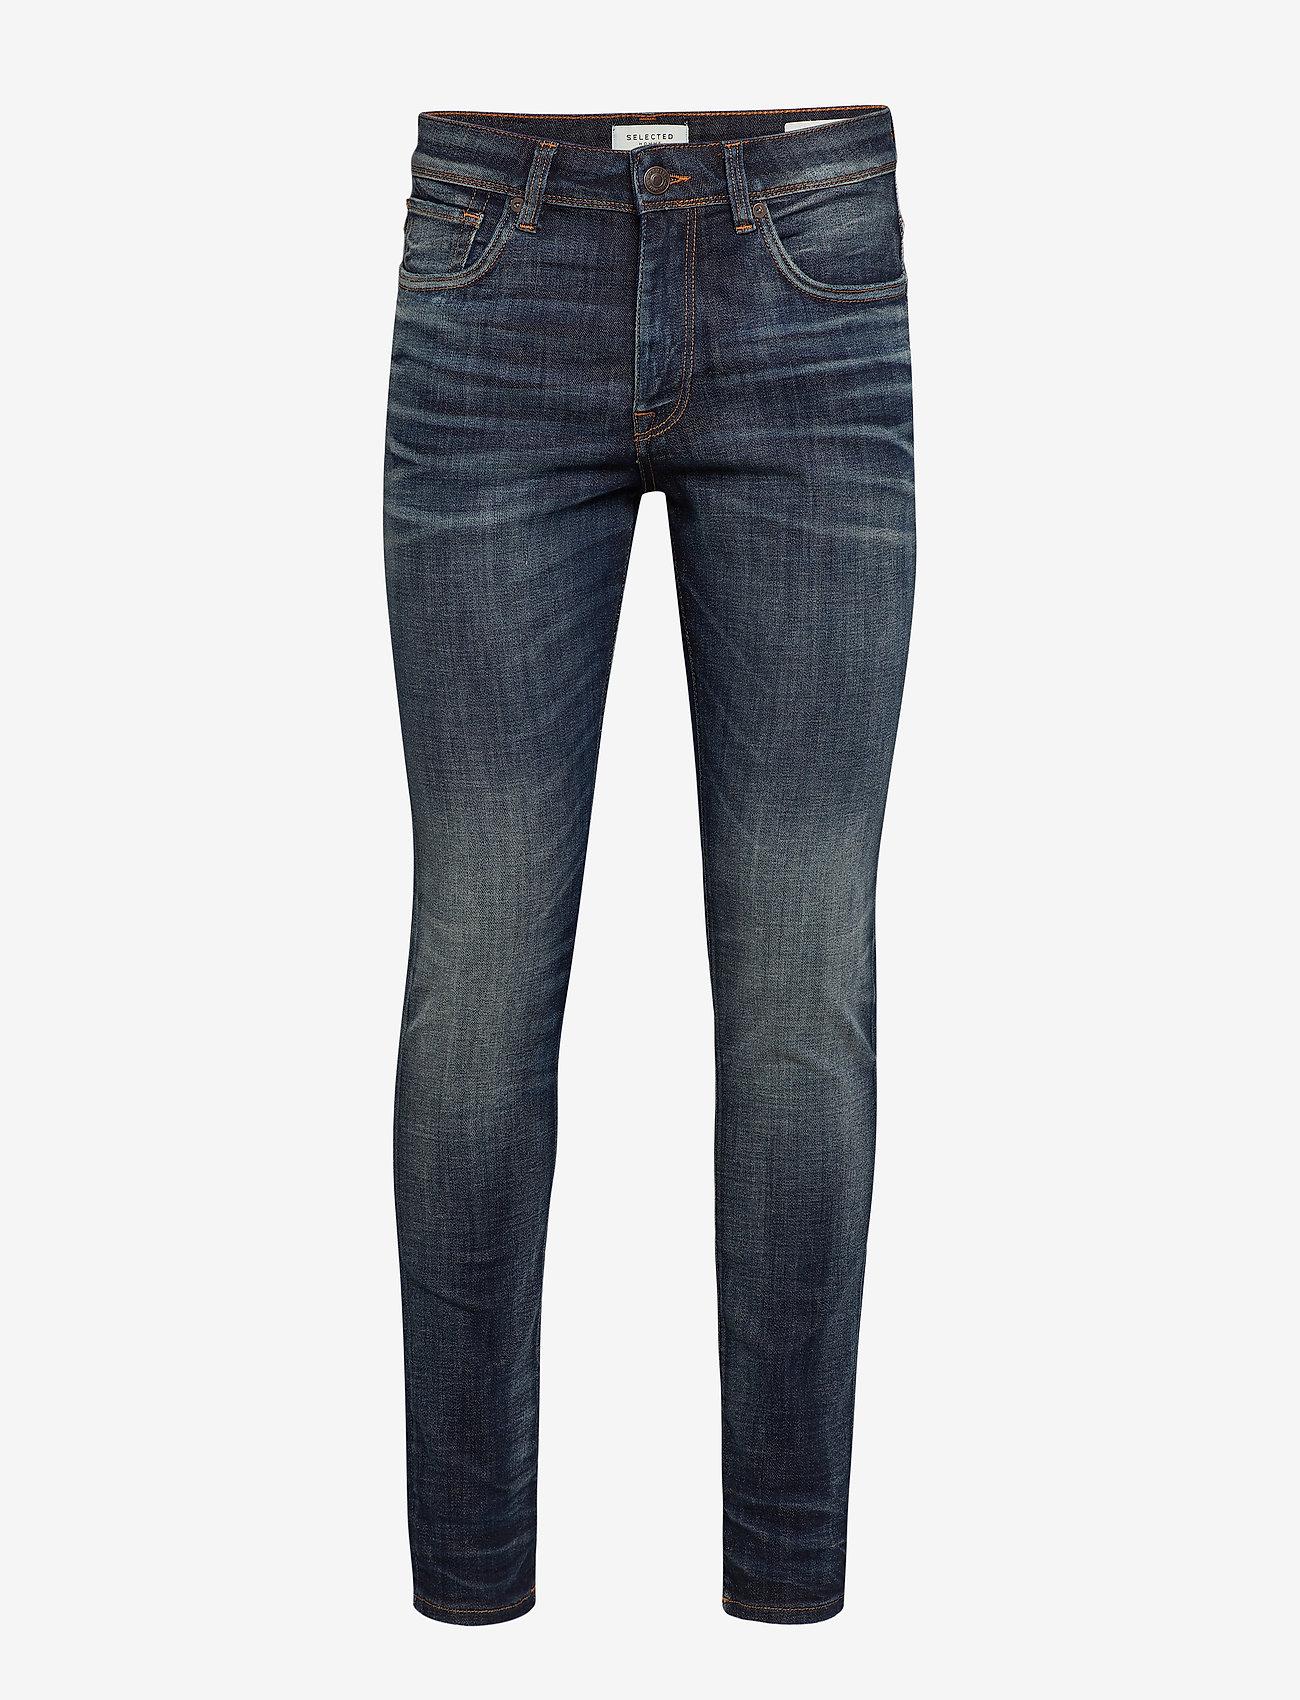 Selected Homme - SLHSLIM-LEON 6164 D. BLUE ST JNS W NOOS - slim jeans - dark blue denim - 0